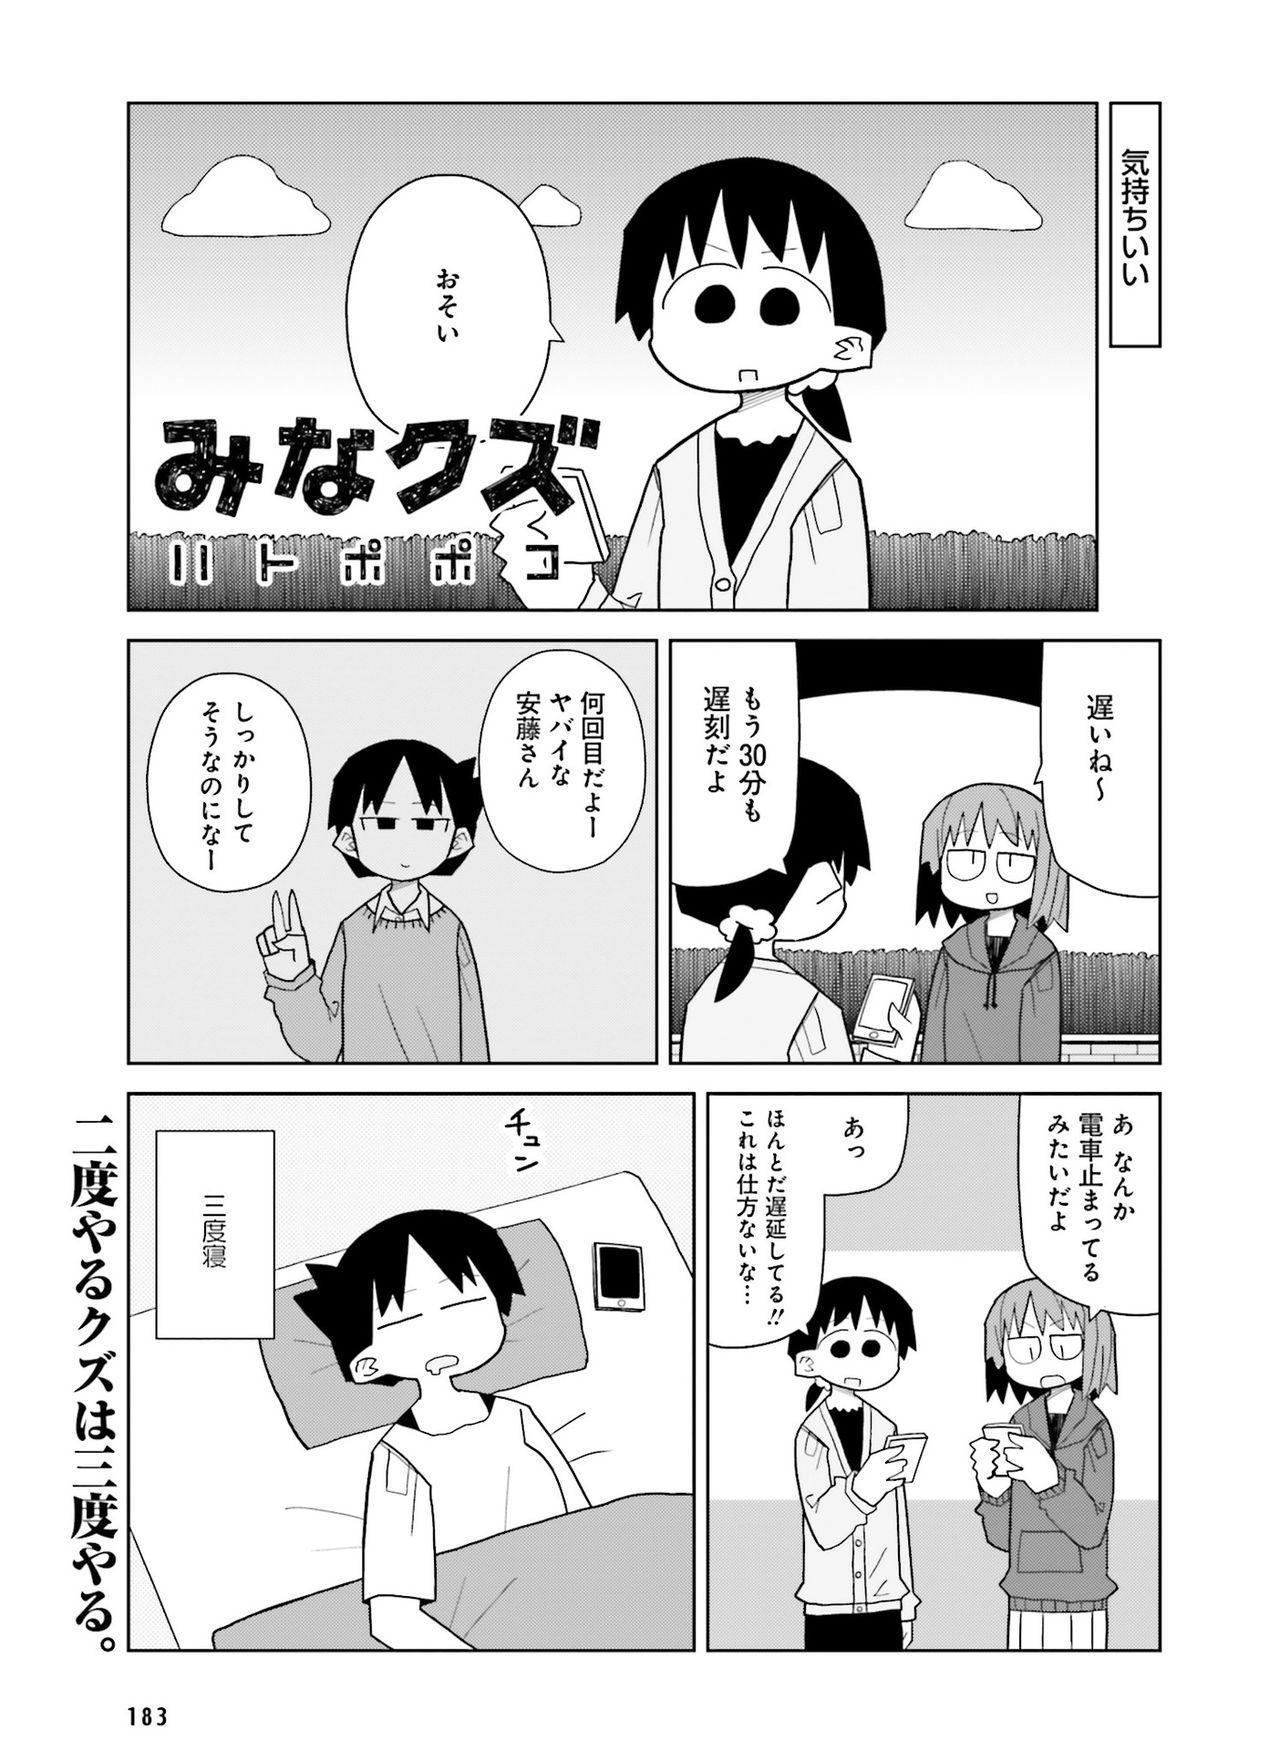 Dengeki Moeoh 2016-12 174